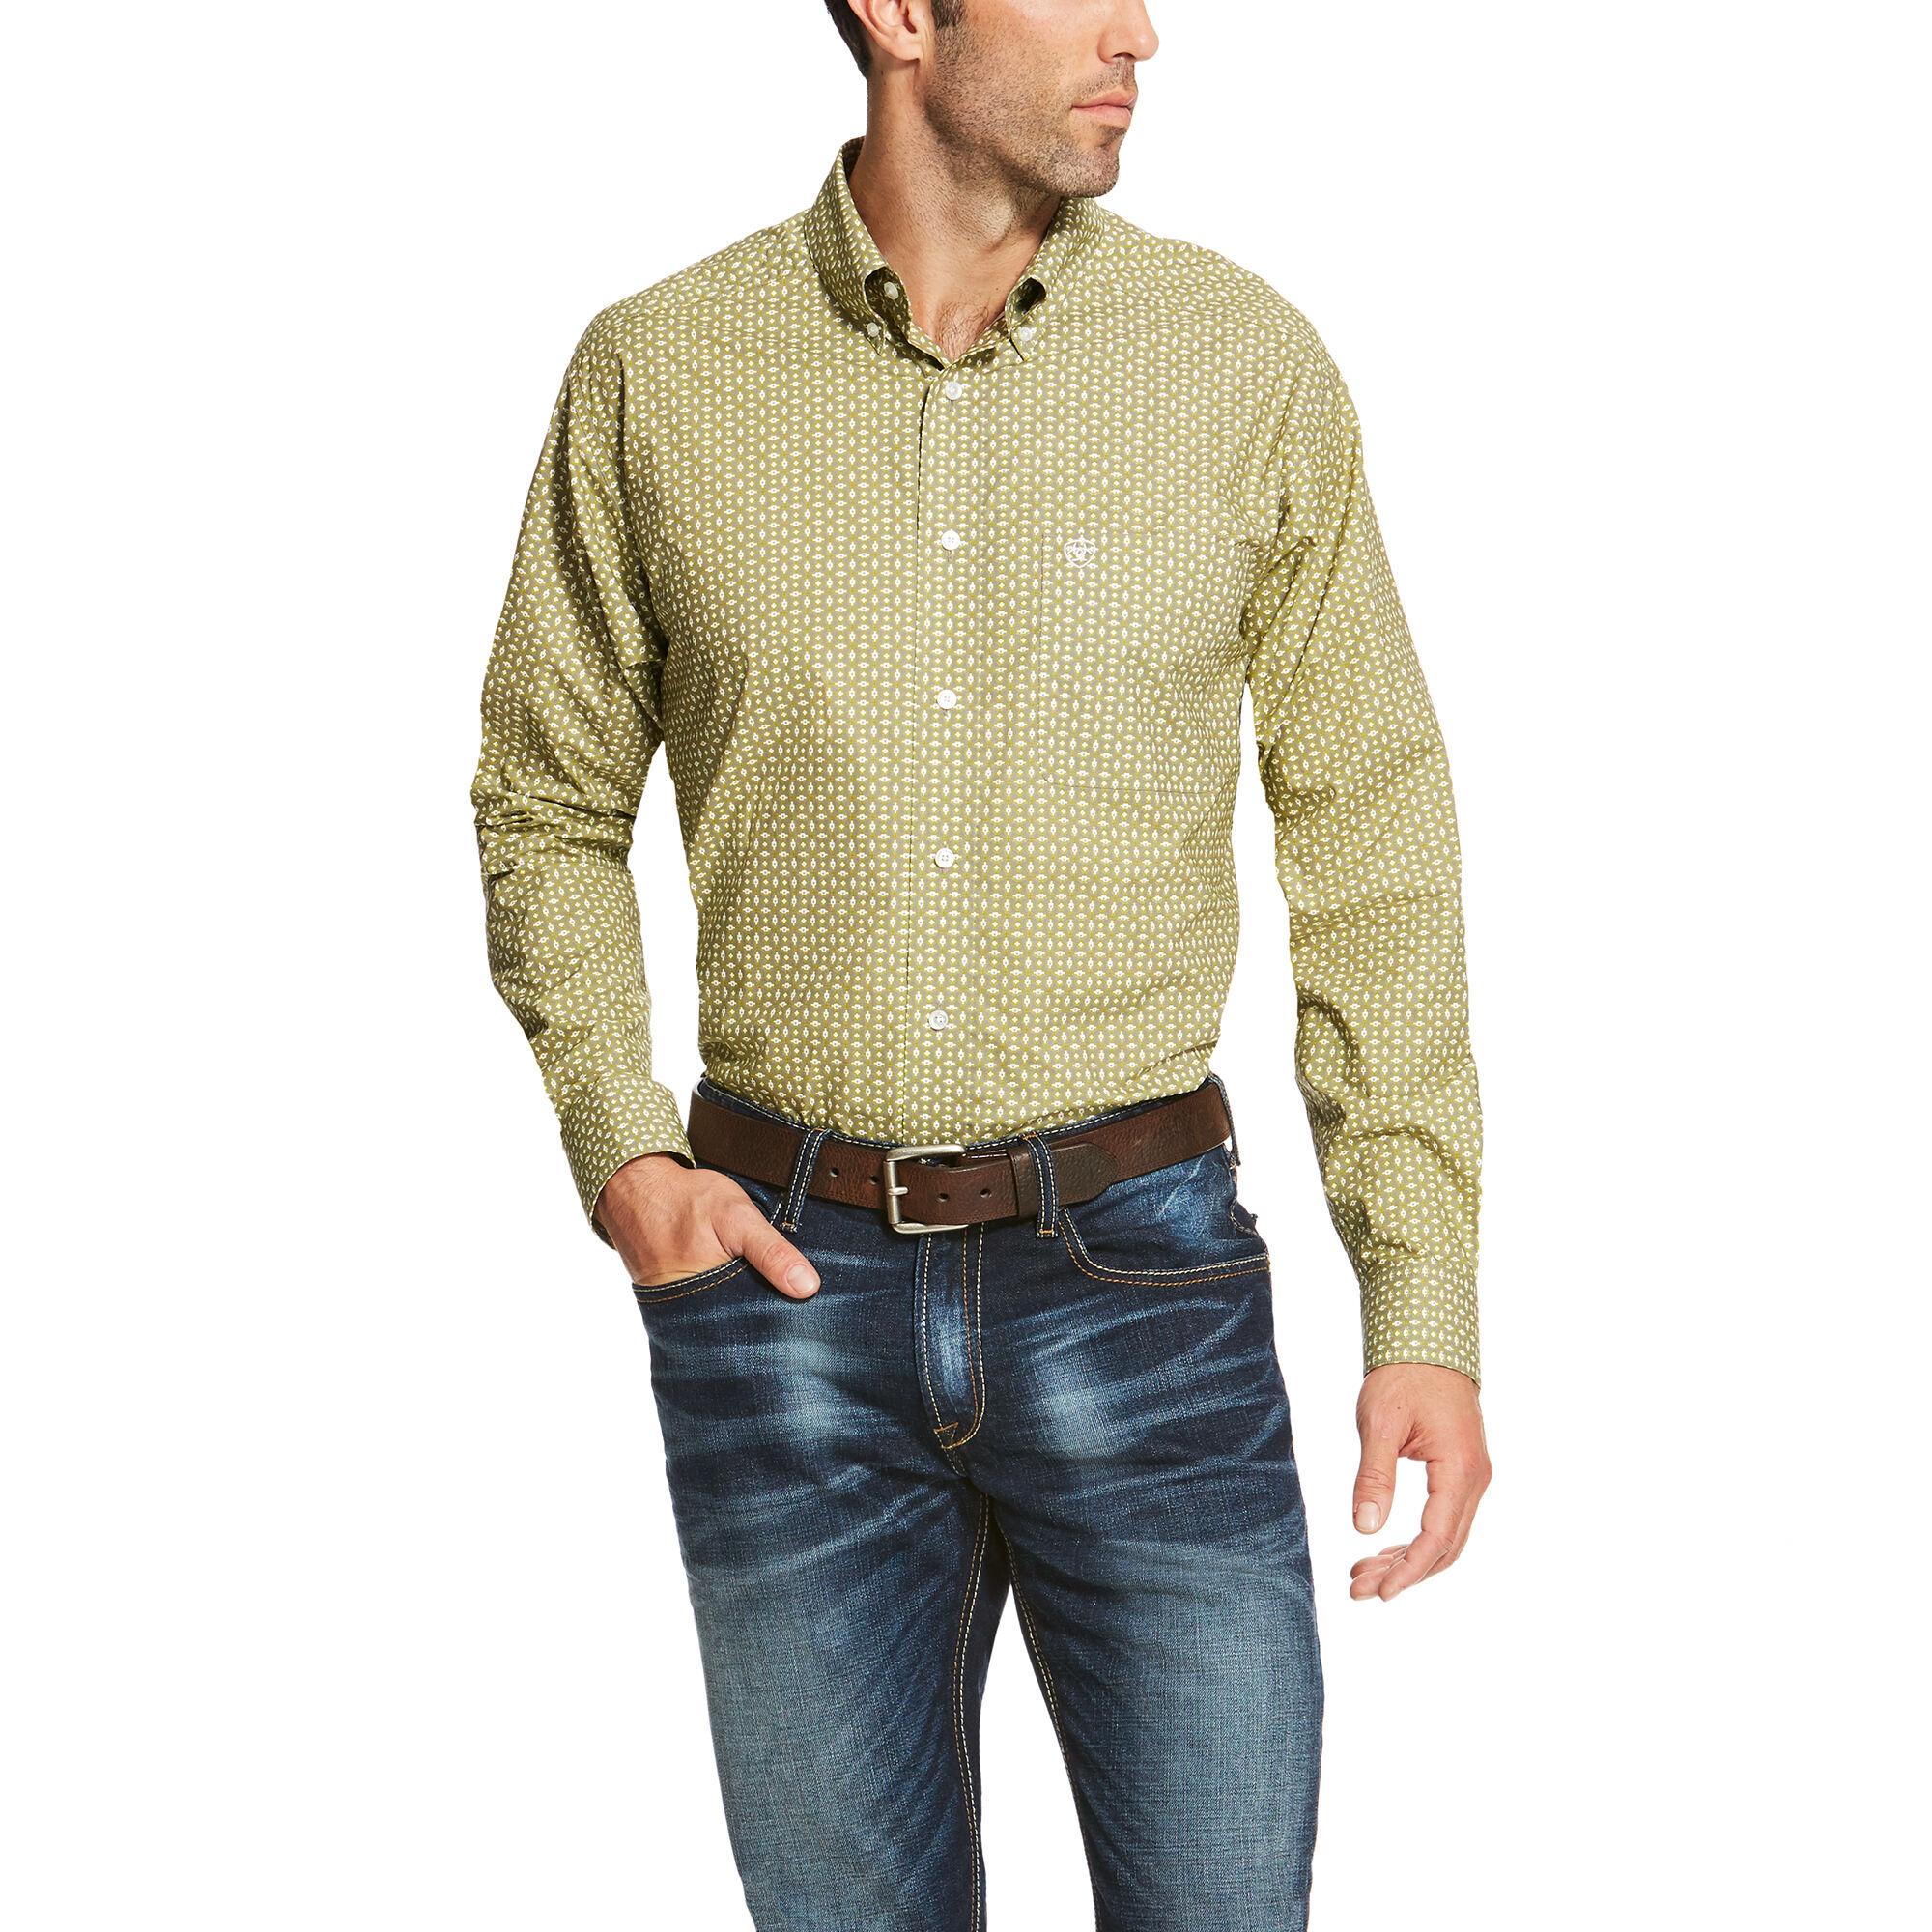 Shiloh Shirt